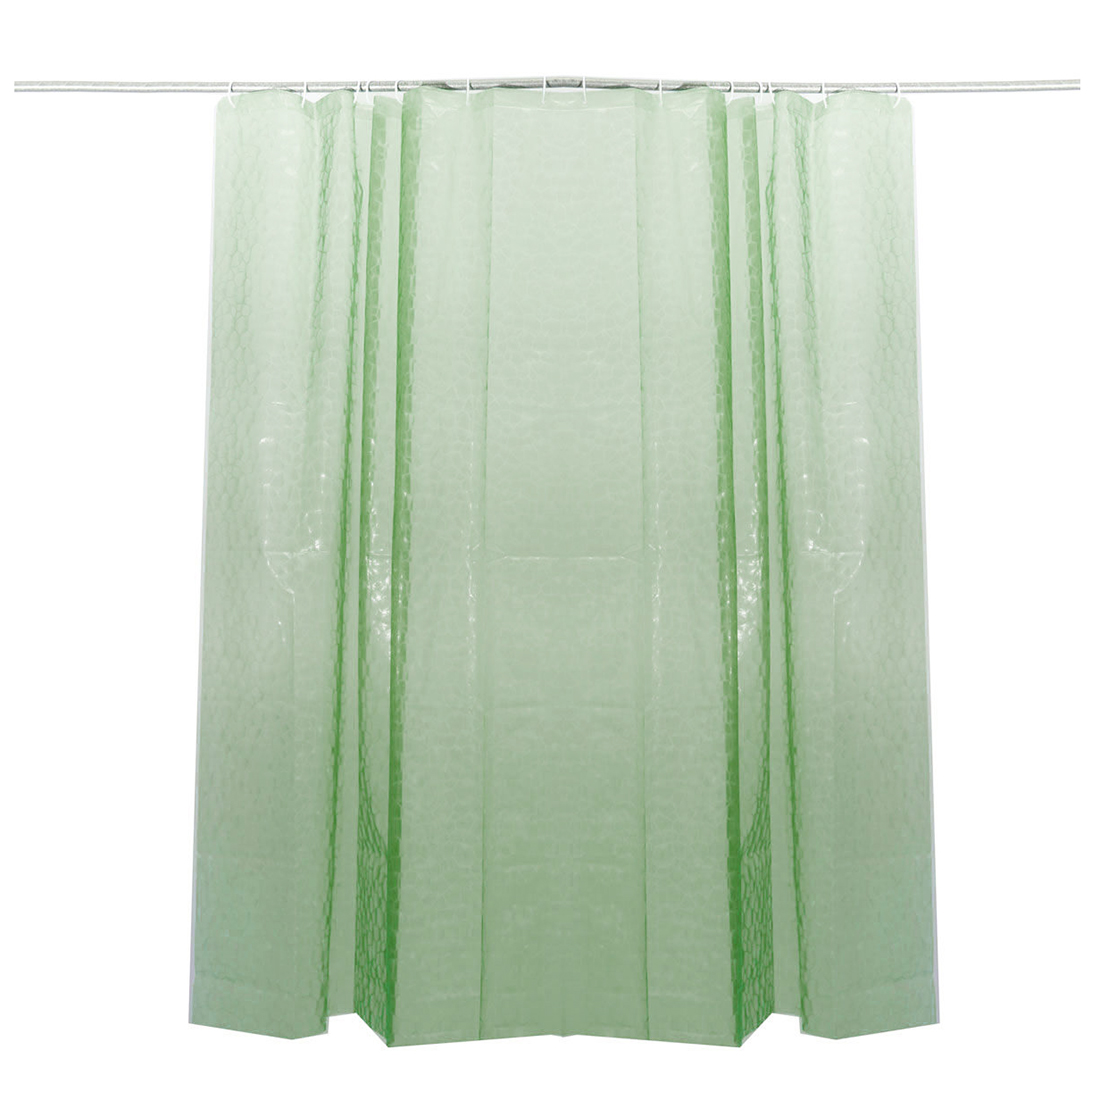 Clear Thicker EVA Bath Shower Curtain 3D Water Cube Mold